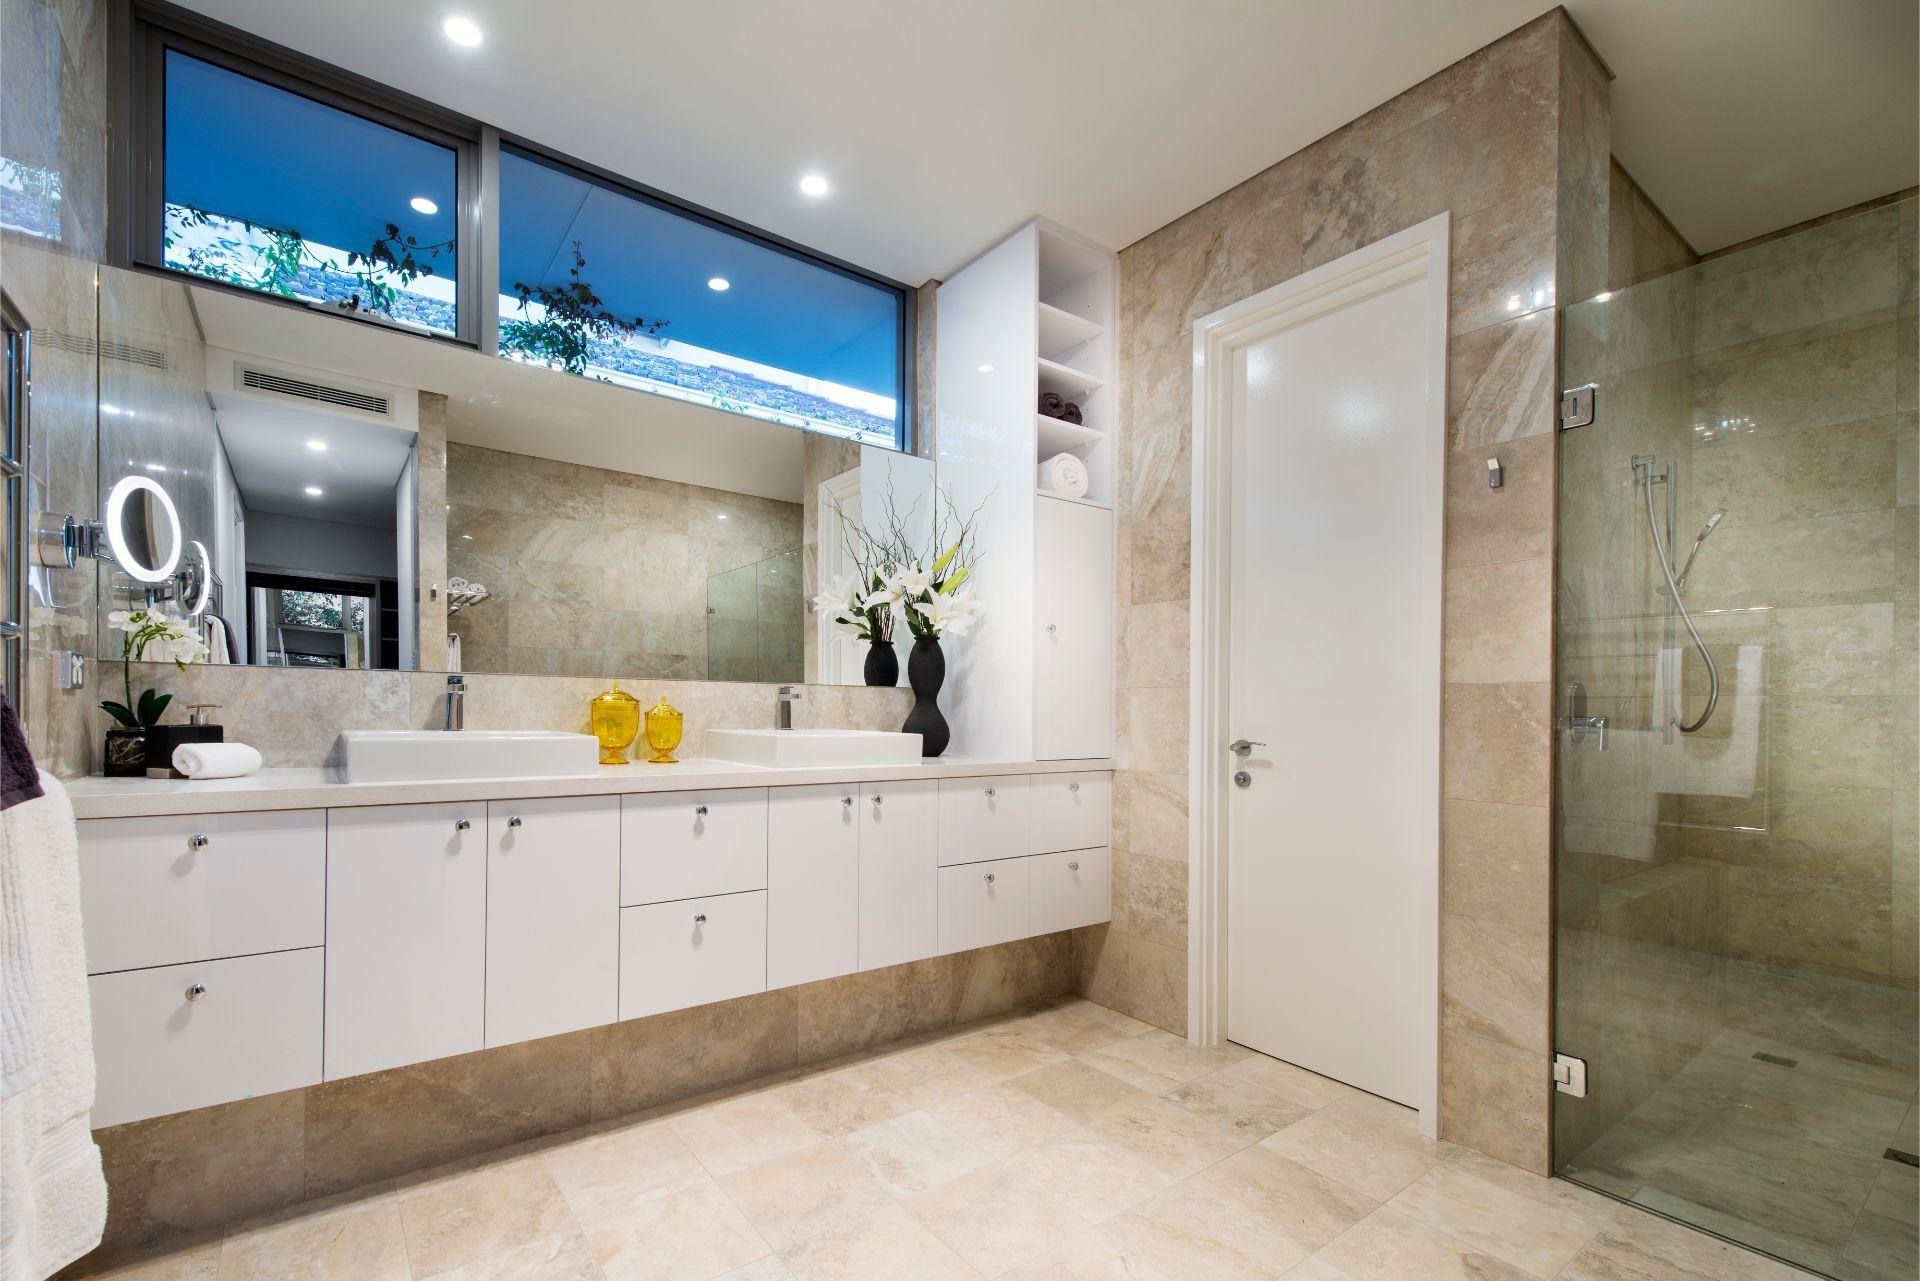 The george-residence-luxury-build-perth.jpg